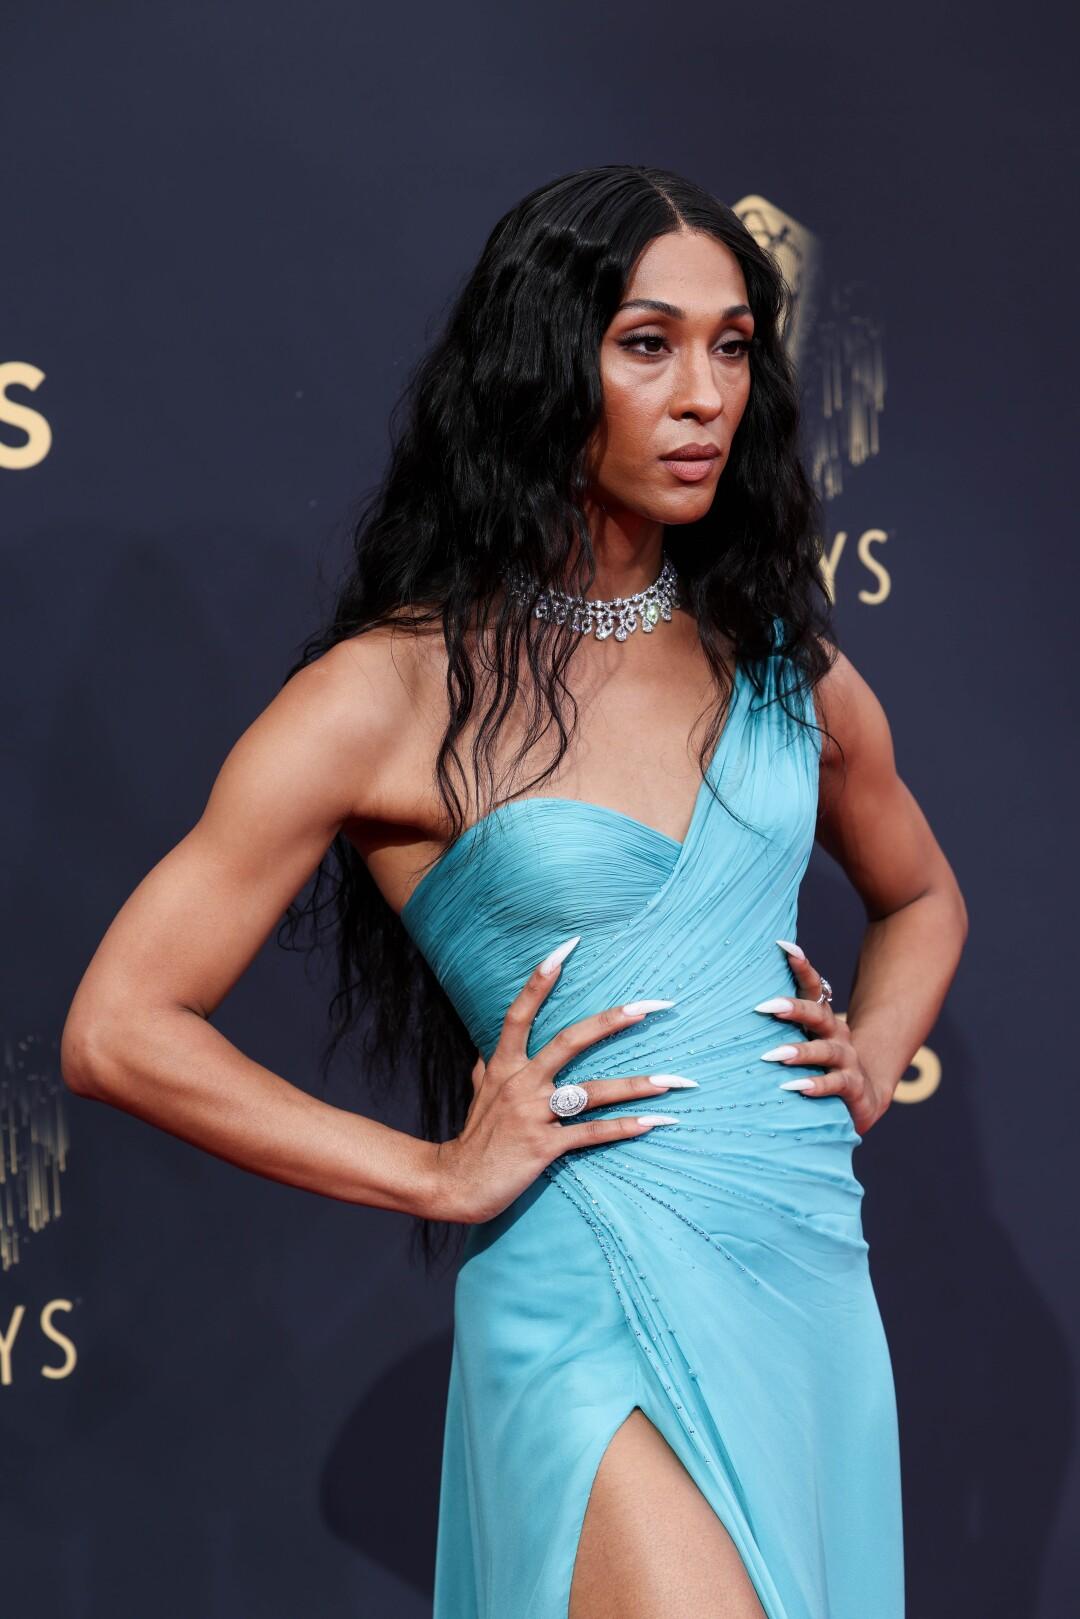 Michaela Jaé Rodriguez strikes a pose in an aqua gown.